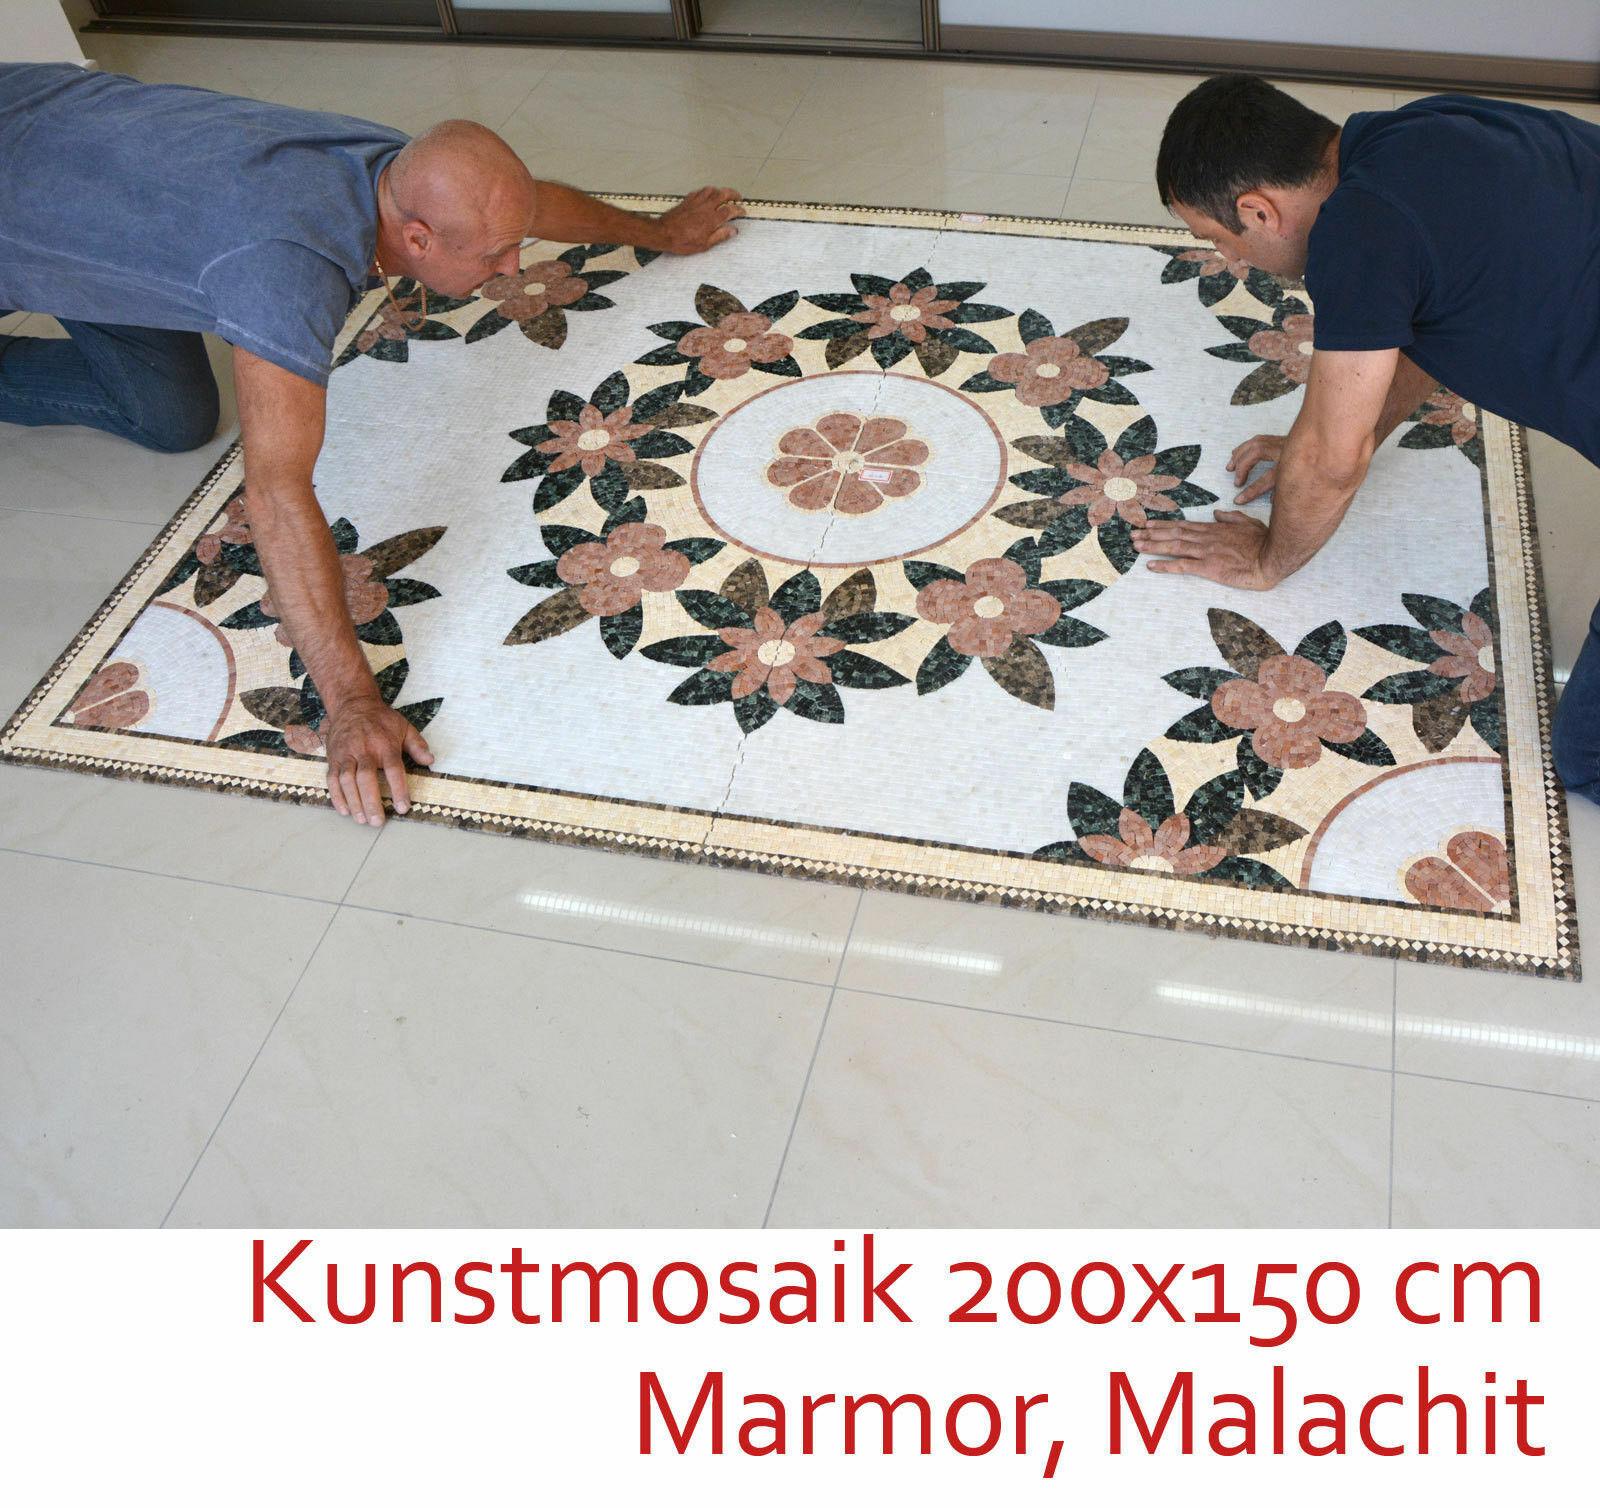 Elegant Mosaik -Bild 200x150cm 3M 2 30.000 Stones Naturestone Diverse